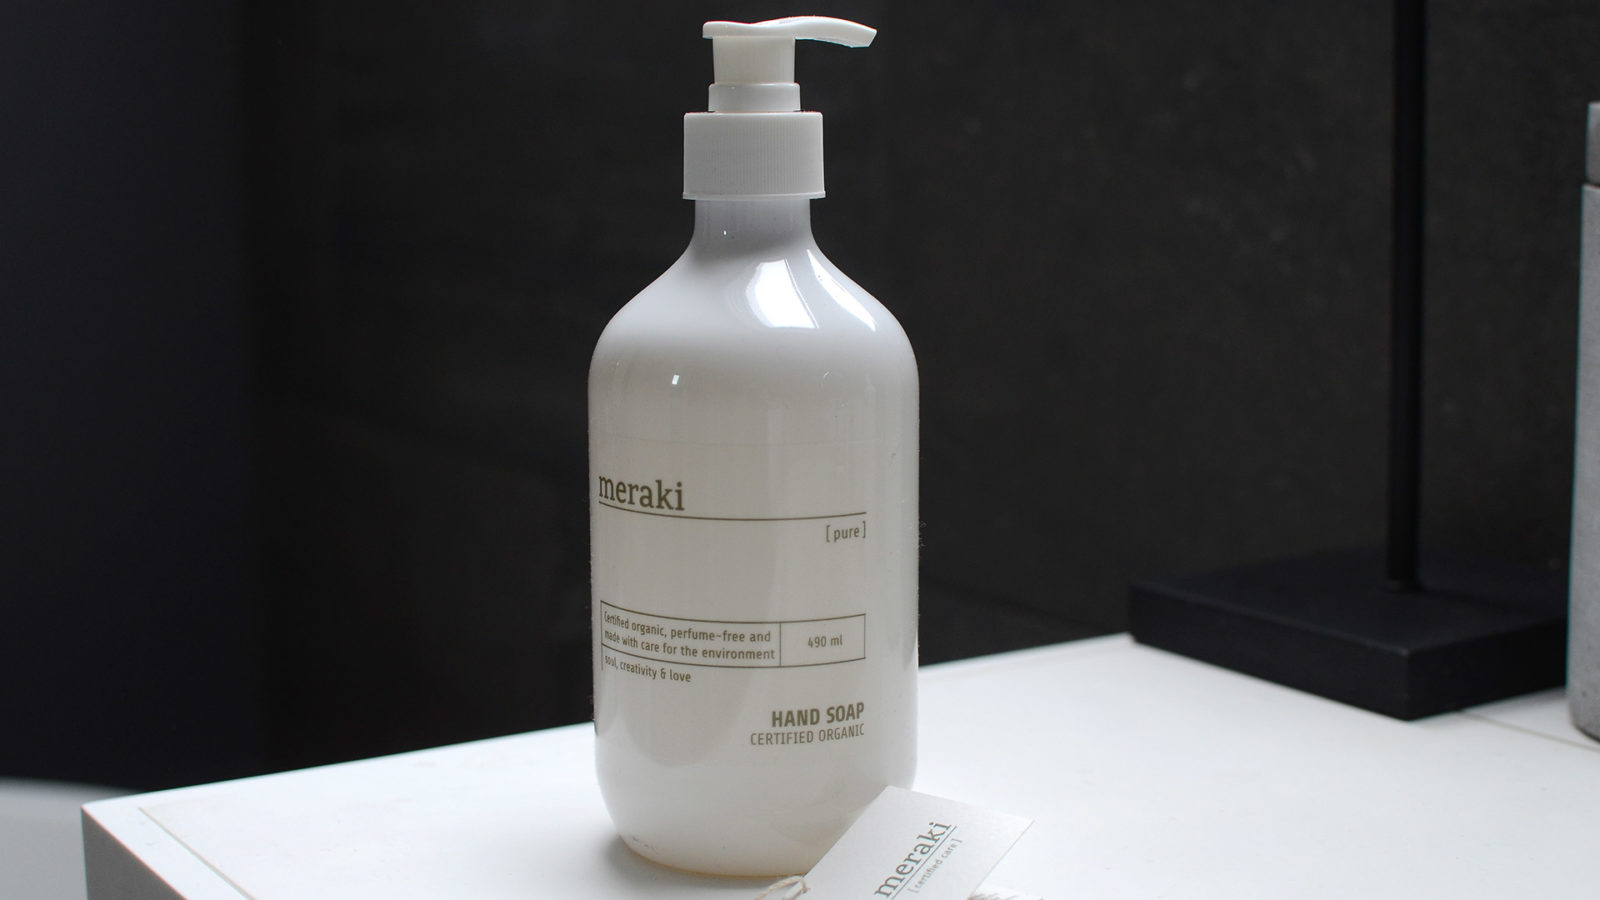 meraki certified organic hand soap